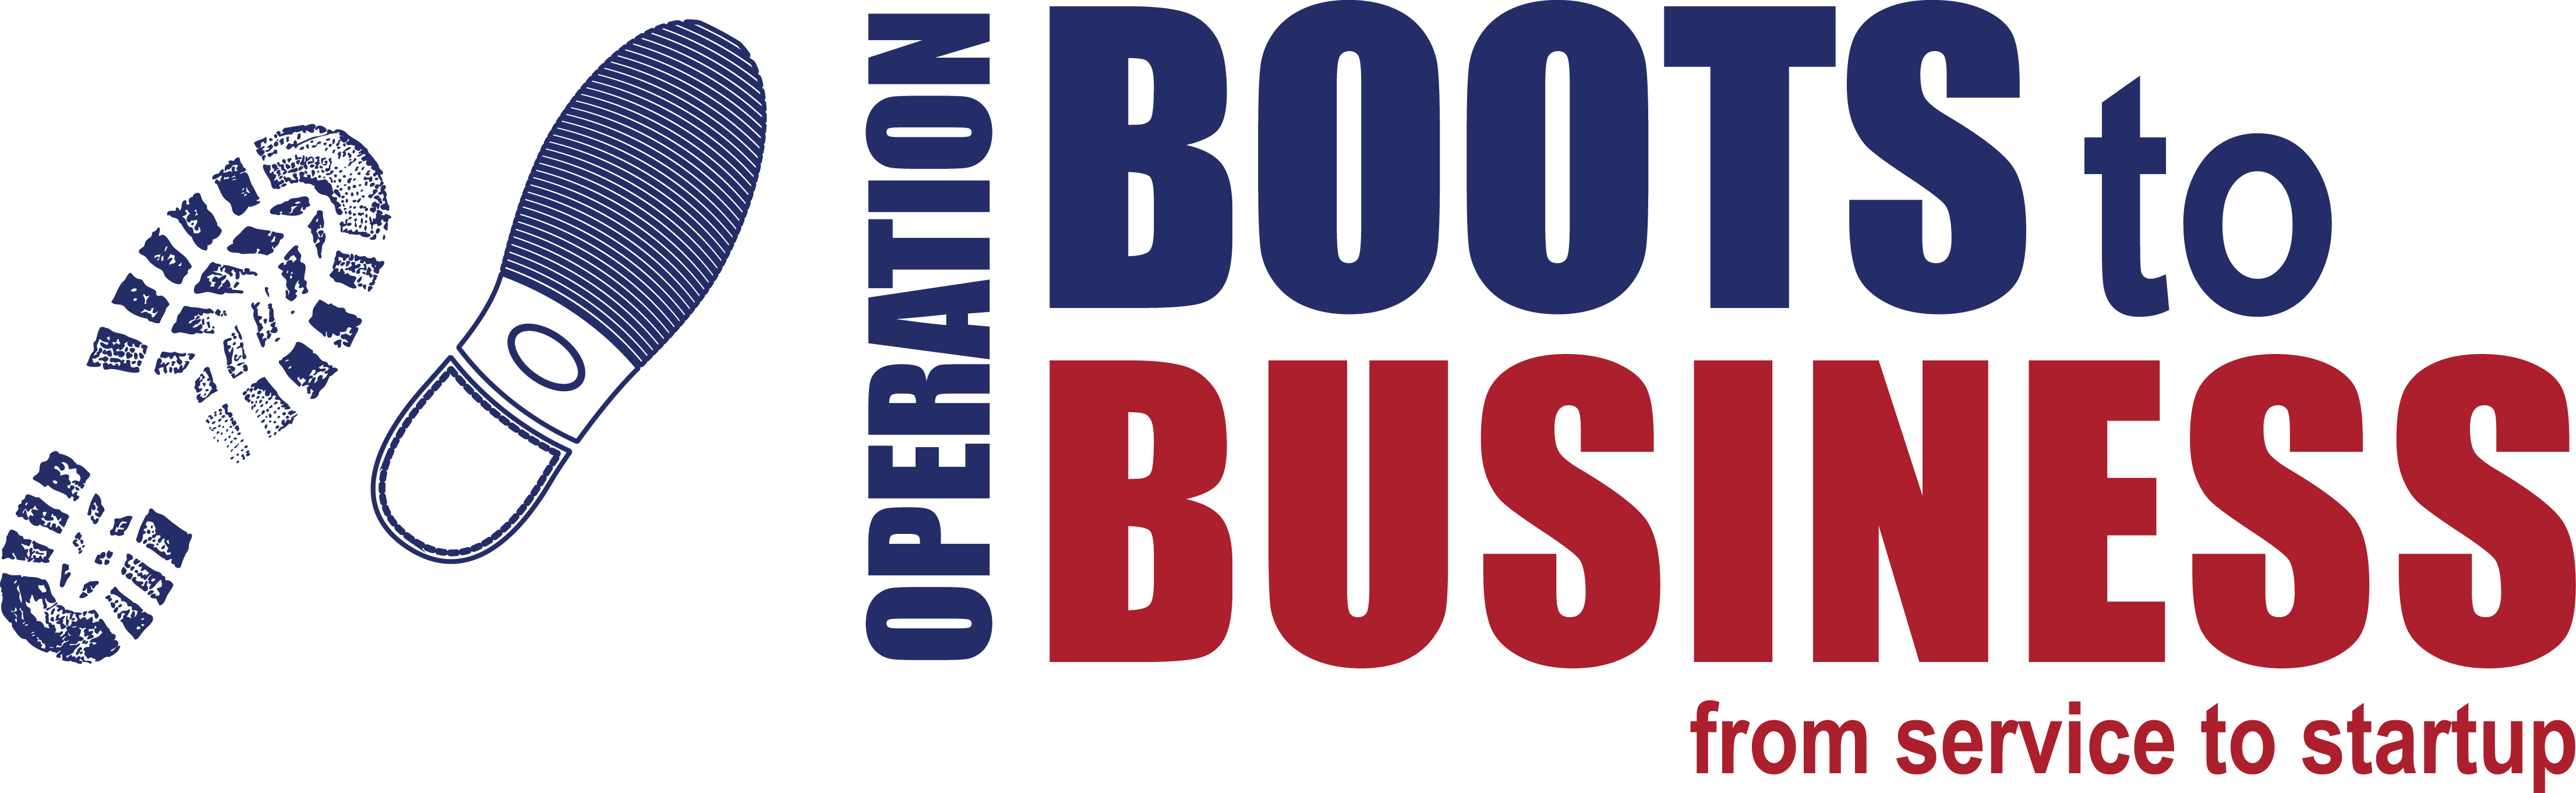 Business plan help for veterans